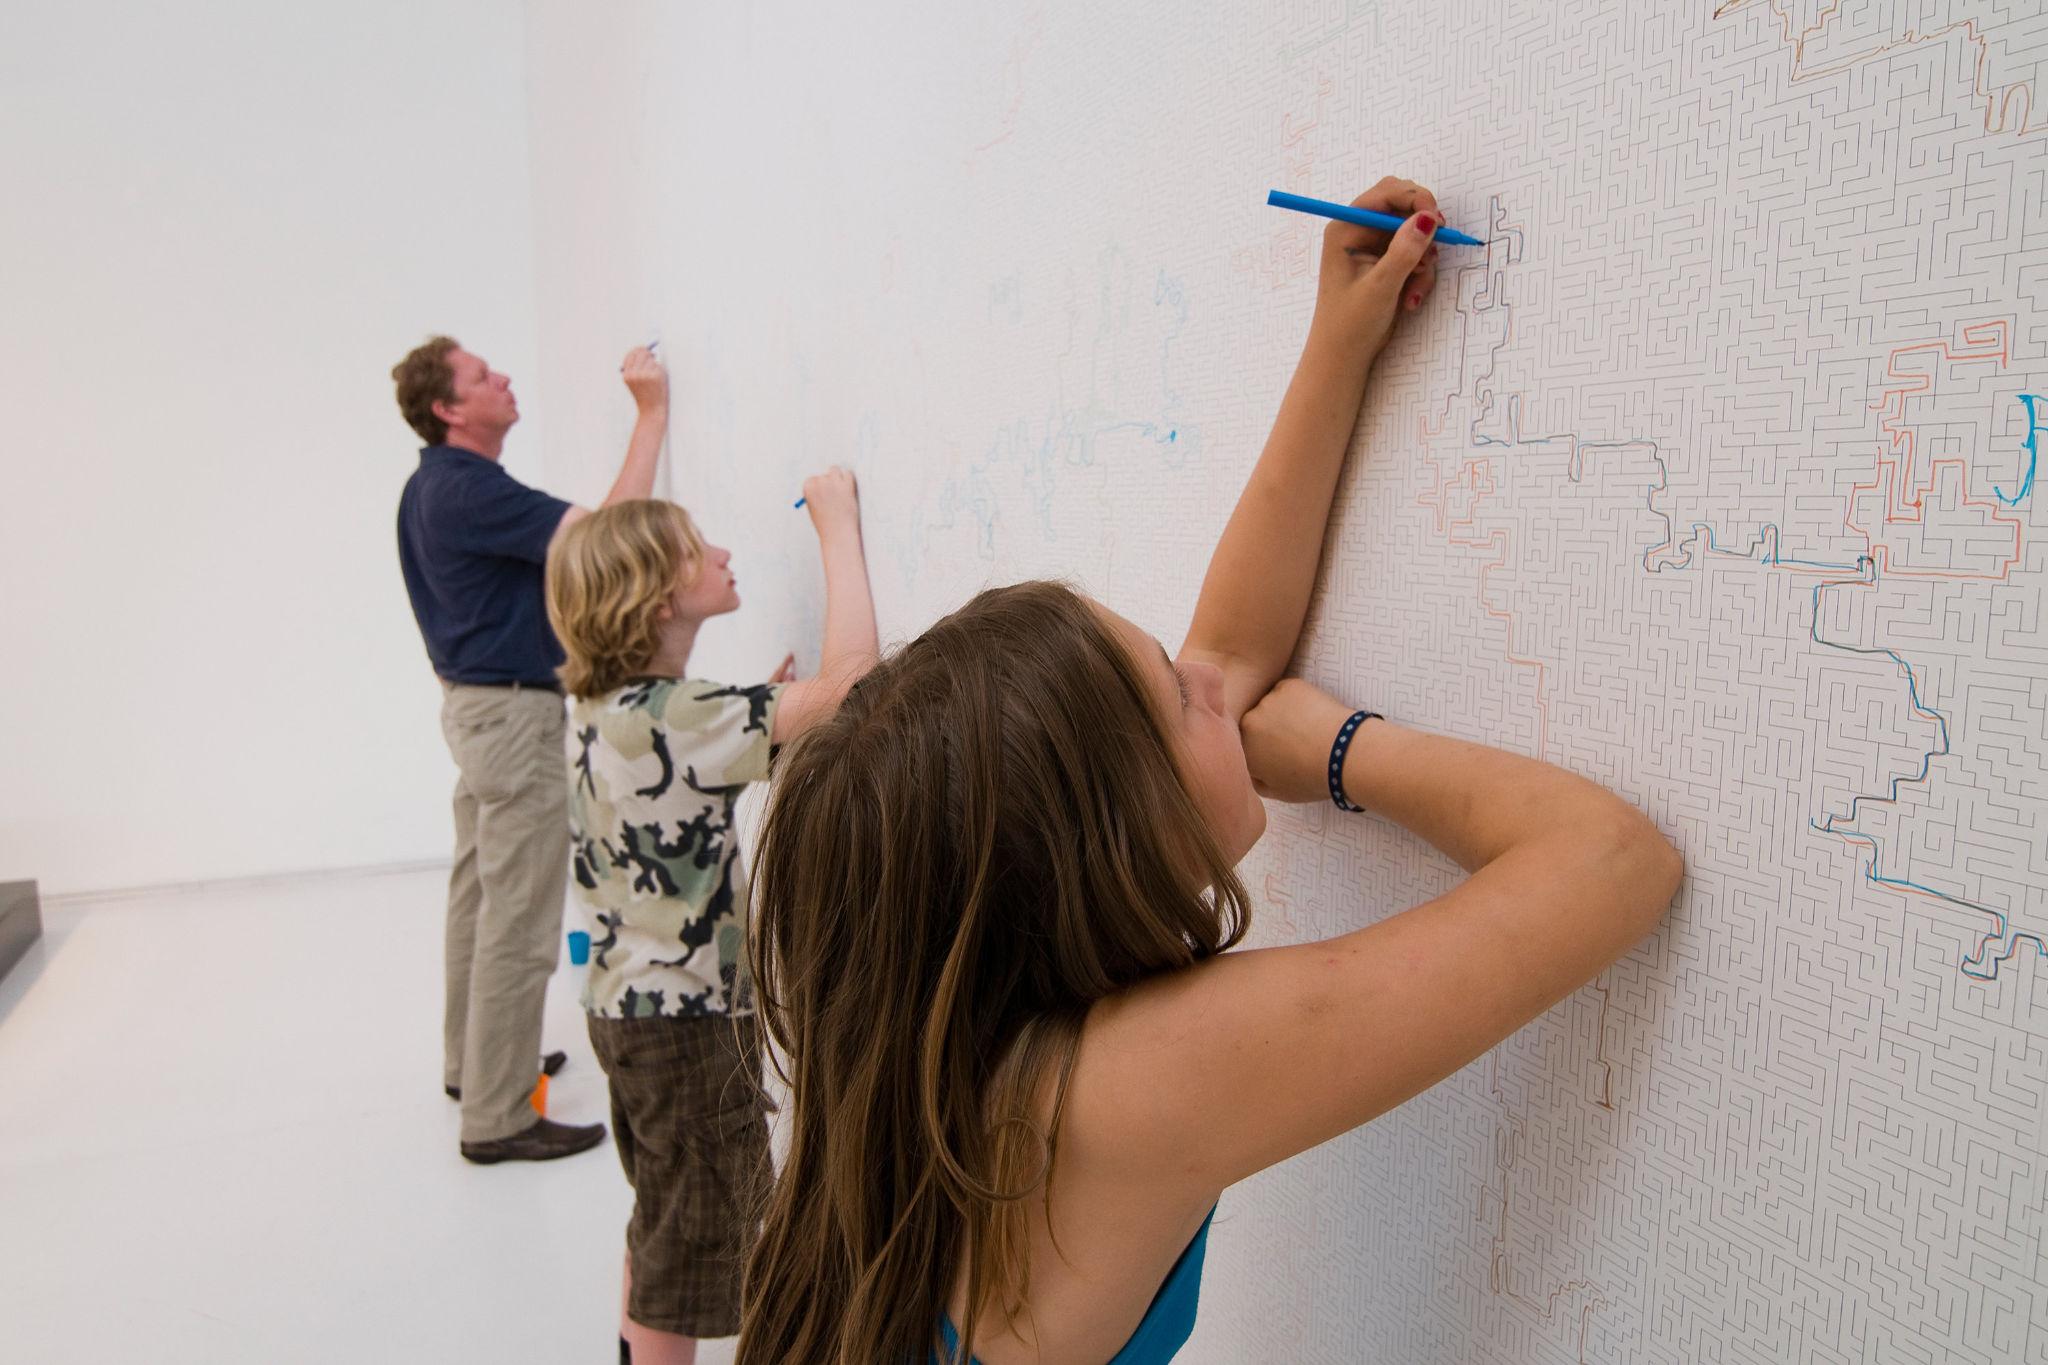 Draw On Walls Crossword Puzzle Wallpaper Designs Ideas On Dornob